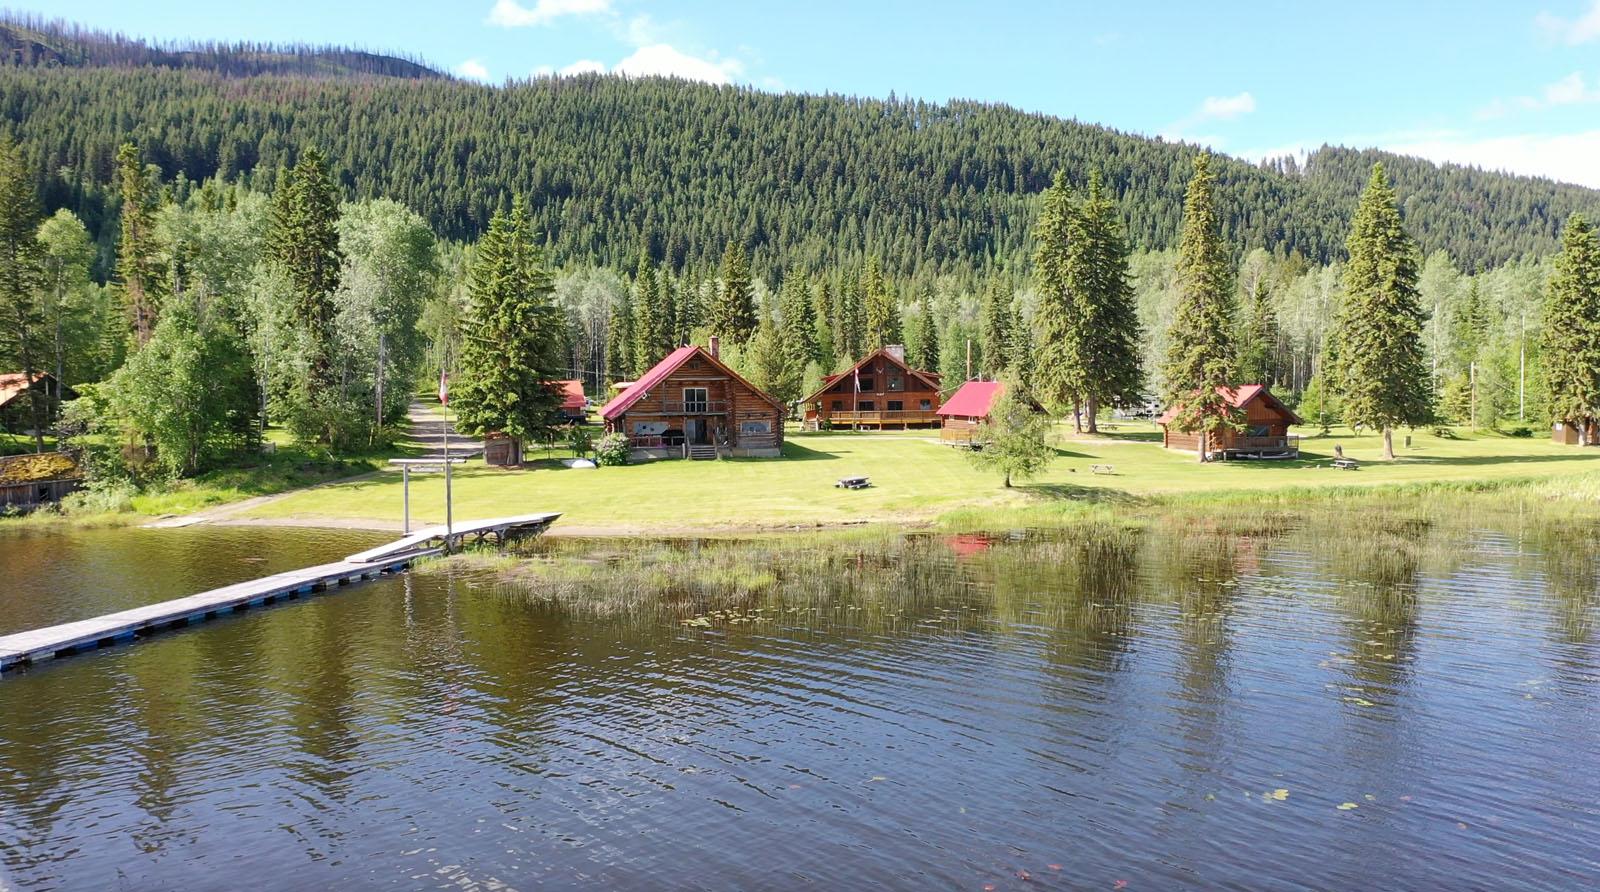 Canim lake resort 11